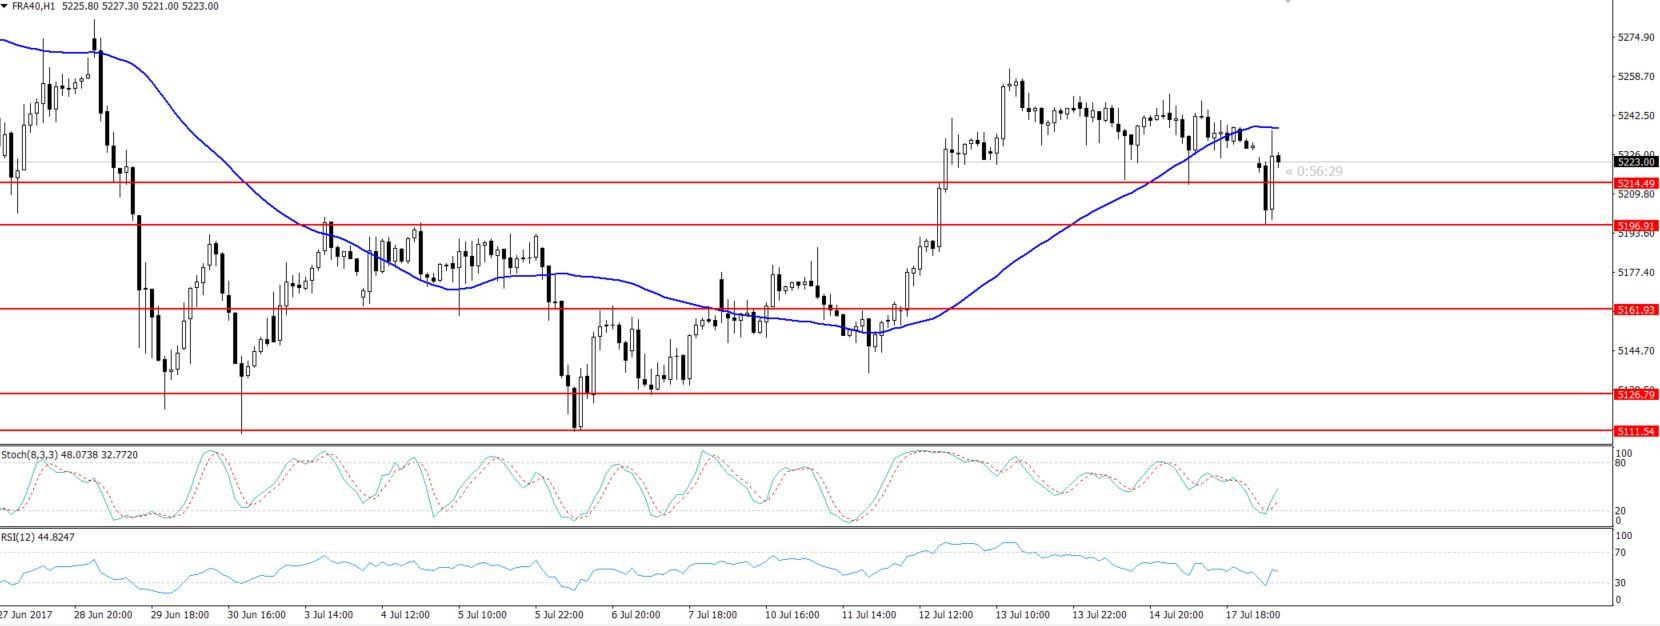 CAC 40 - Hourly Chart - Bearish Trend Resistance